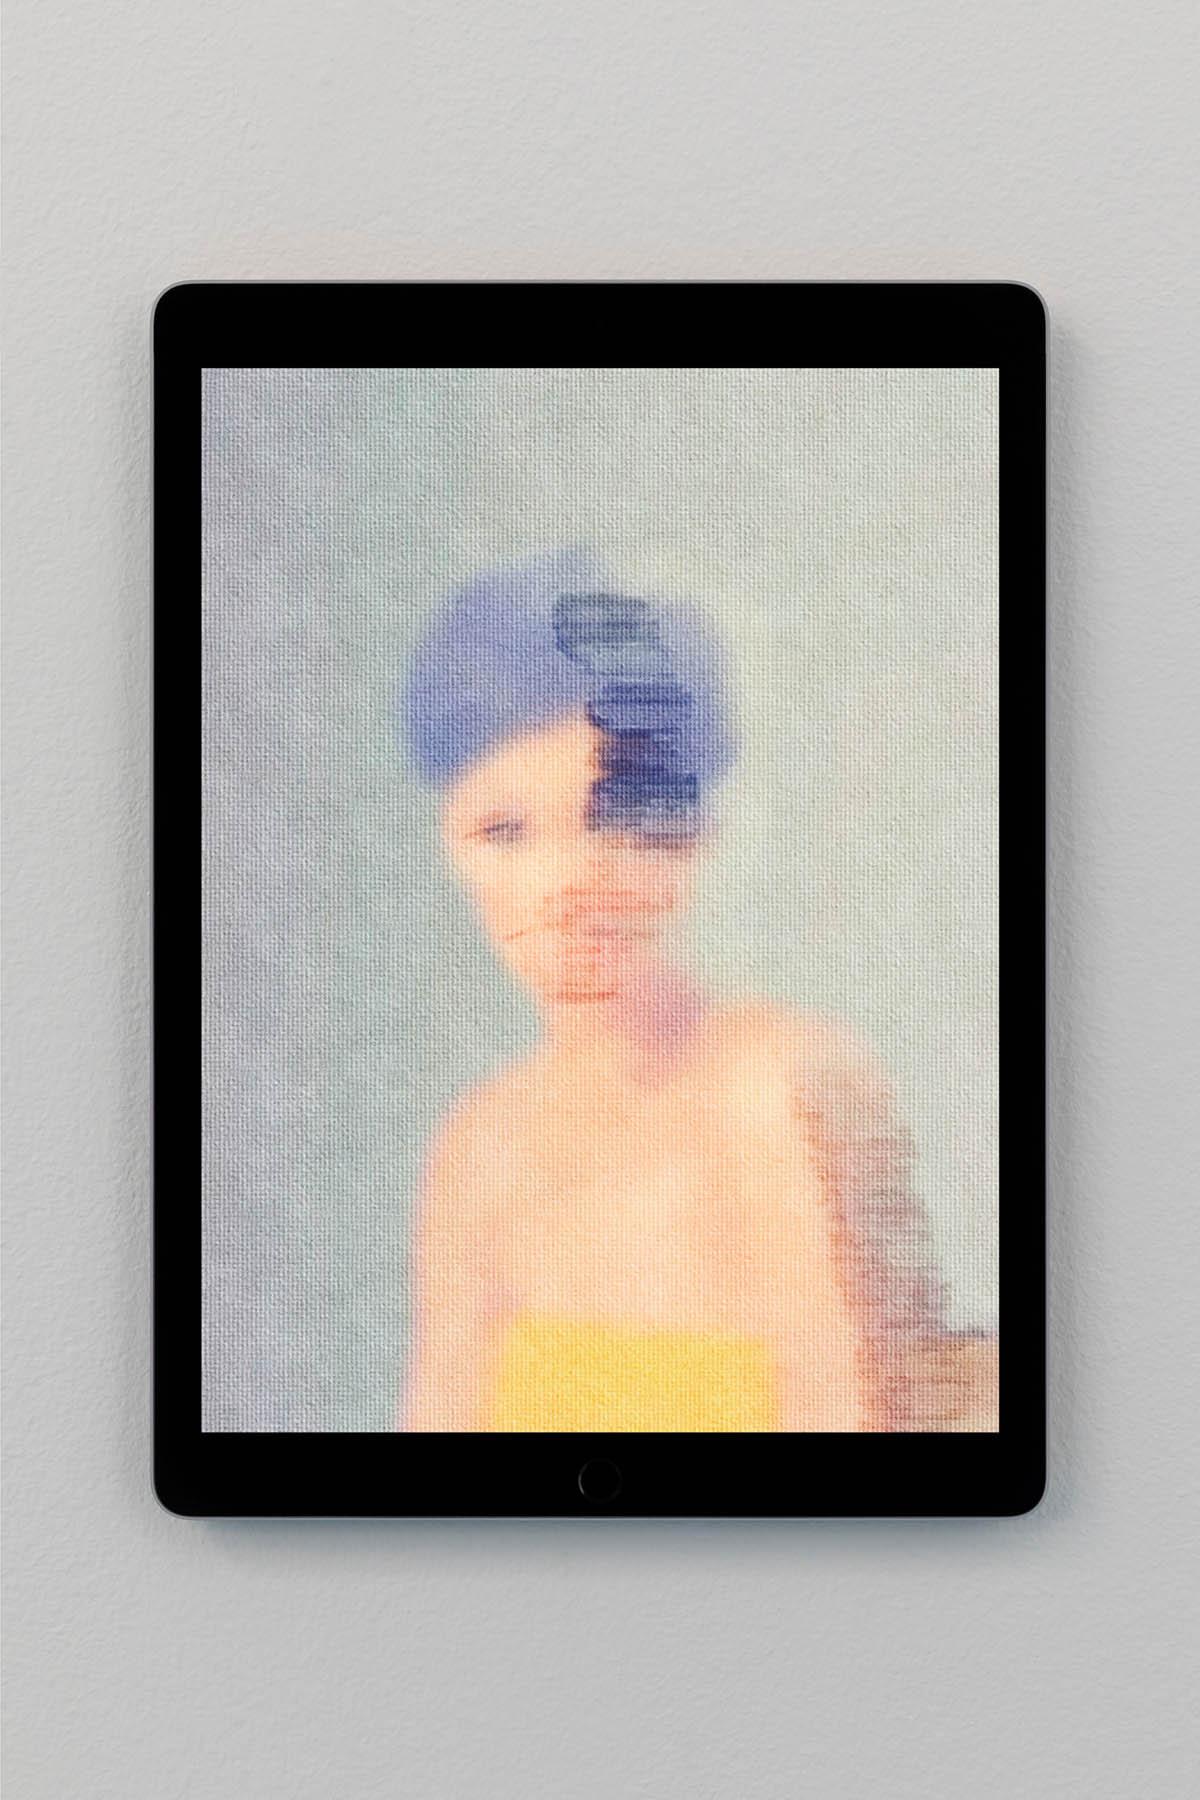 Riccardo Benassi, Scarecrows, Shown On Apple iPad Pro, 2017. Apple iPad Pro, slideshow 25.1 x 17.4 x 0.6 cm. Photo: Roberto Marossi, Courtesy: artist & ZERO. Milano installation view, Massimo Grimaldi, Scarecrows, ZERO..., Milan. Section: Established Contemporary